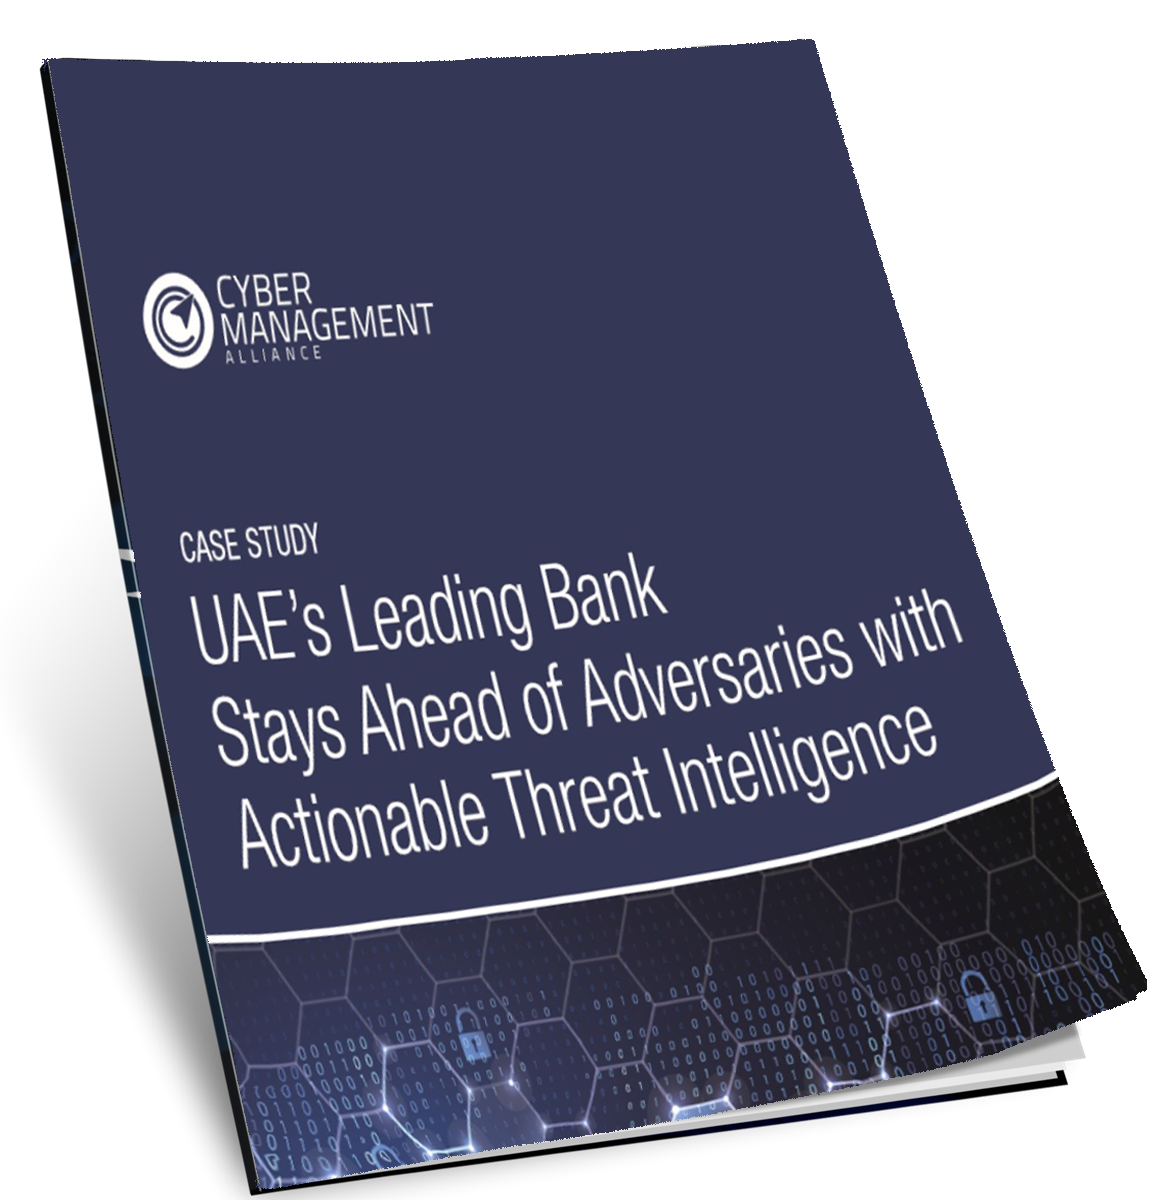 UAE Threat Intelligence Case Study Report